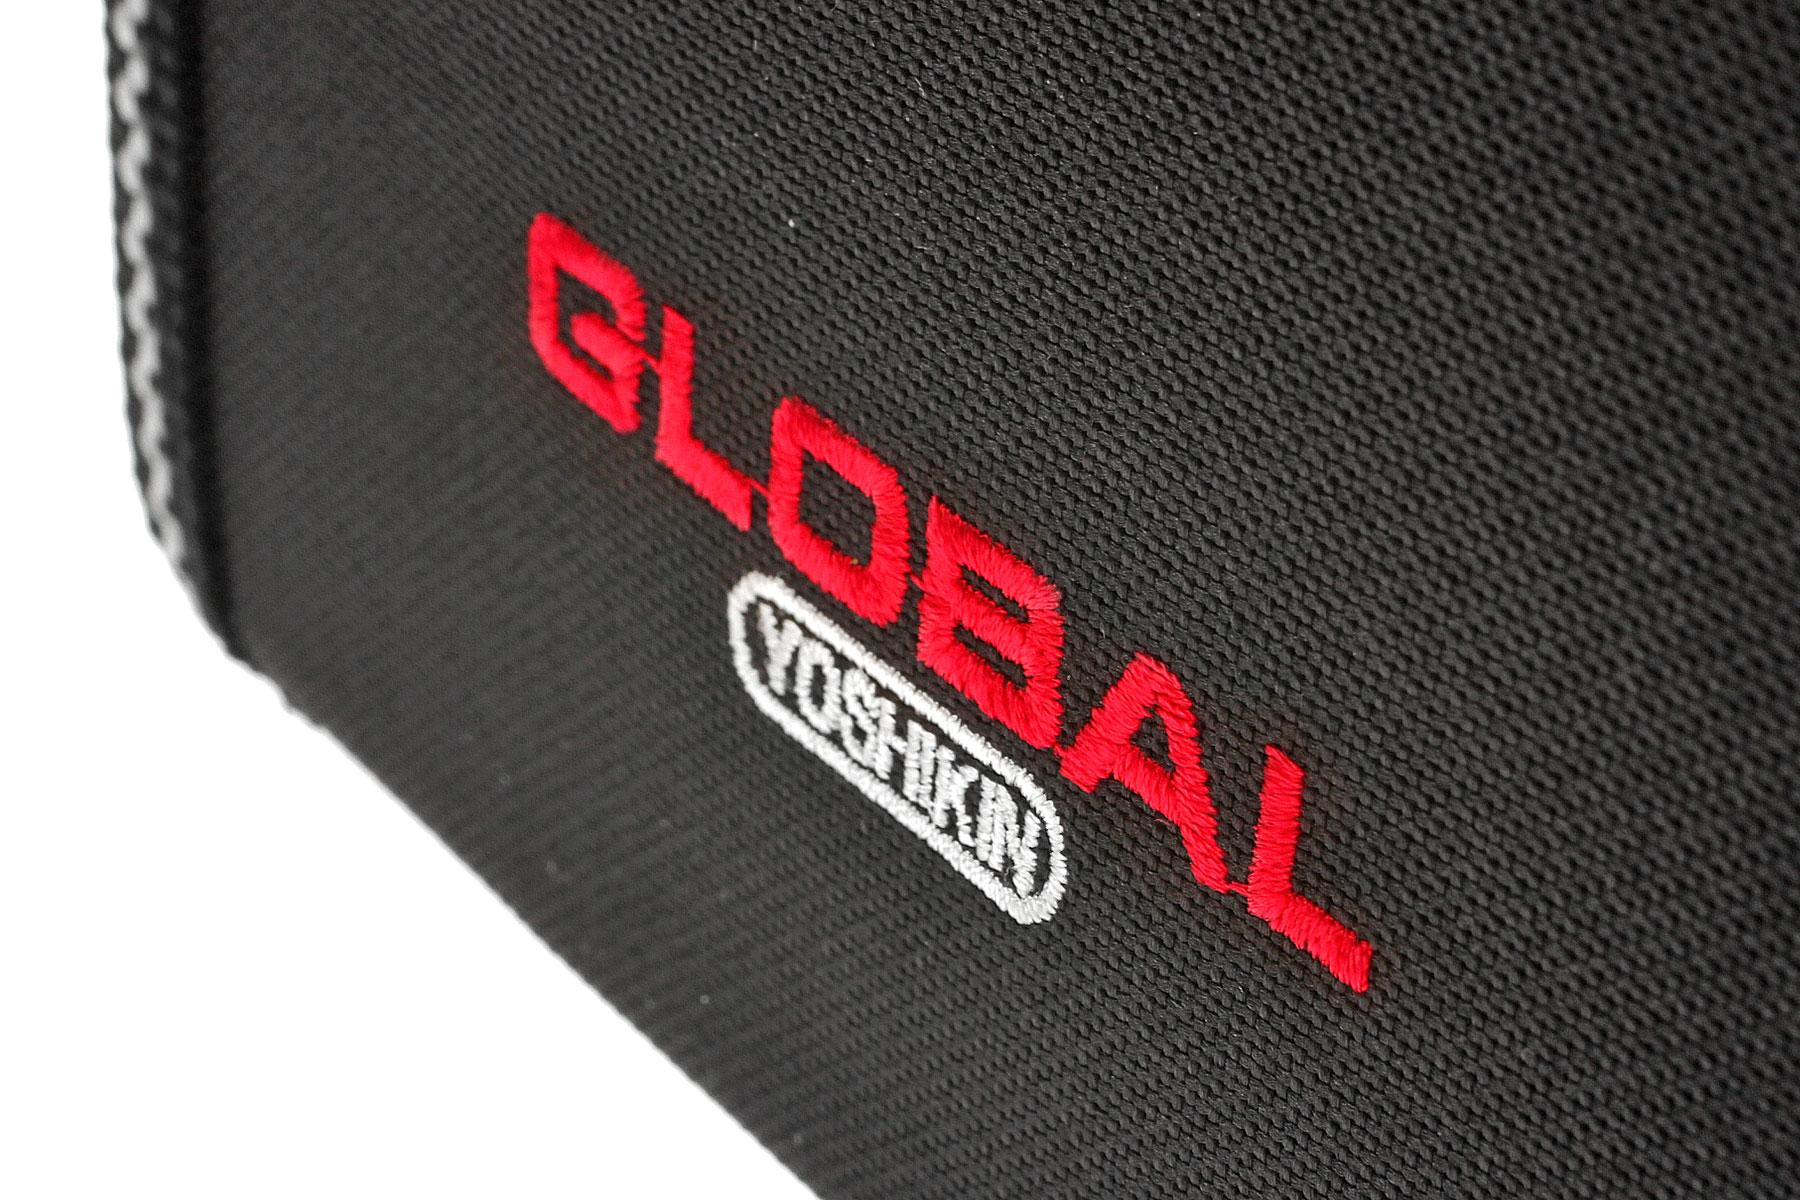 trousse couteaux global g667 16 global. Black Bedroom Furniture Sets. Home Design Ideas